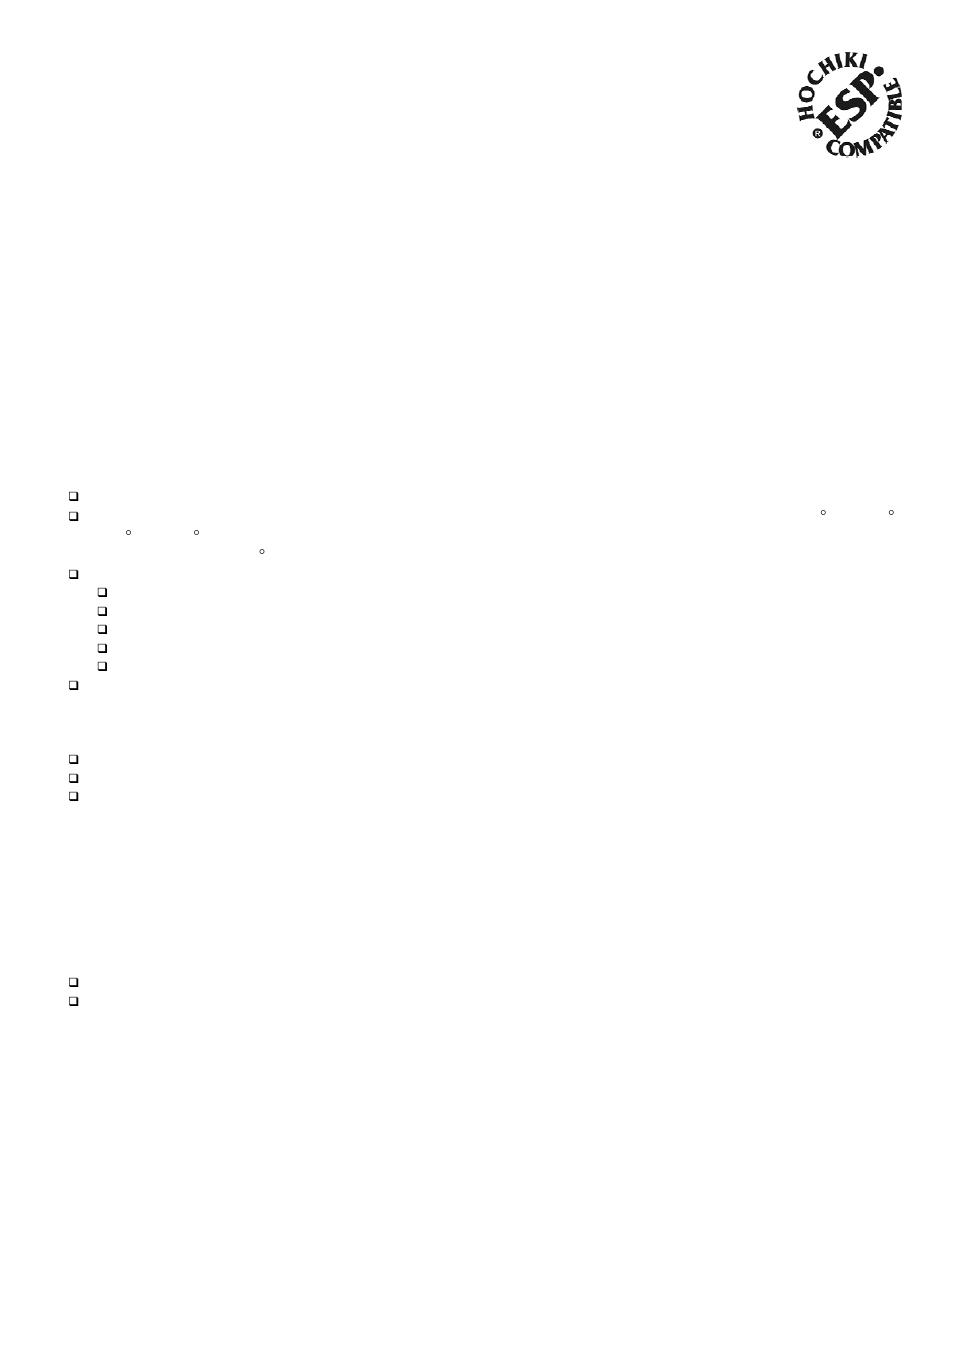 HOCHIKI YBN-R//3 ESP Range Smoke Fire Alarm Sensor Detector Common Mounting Base